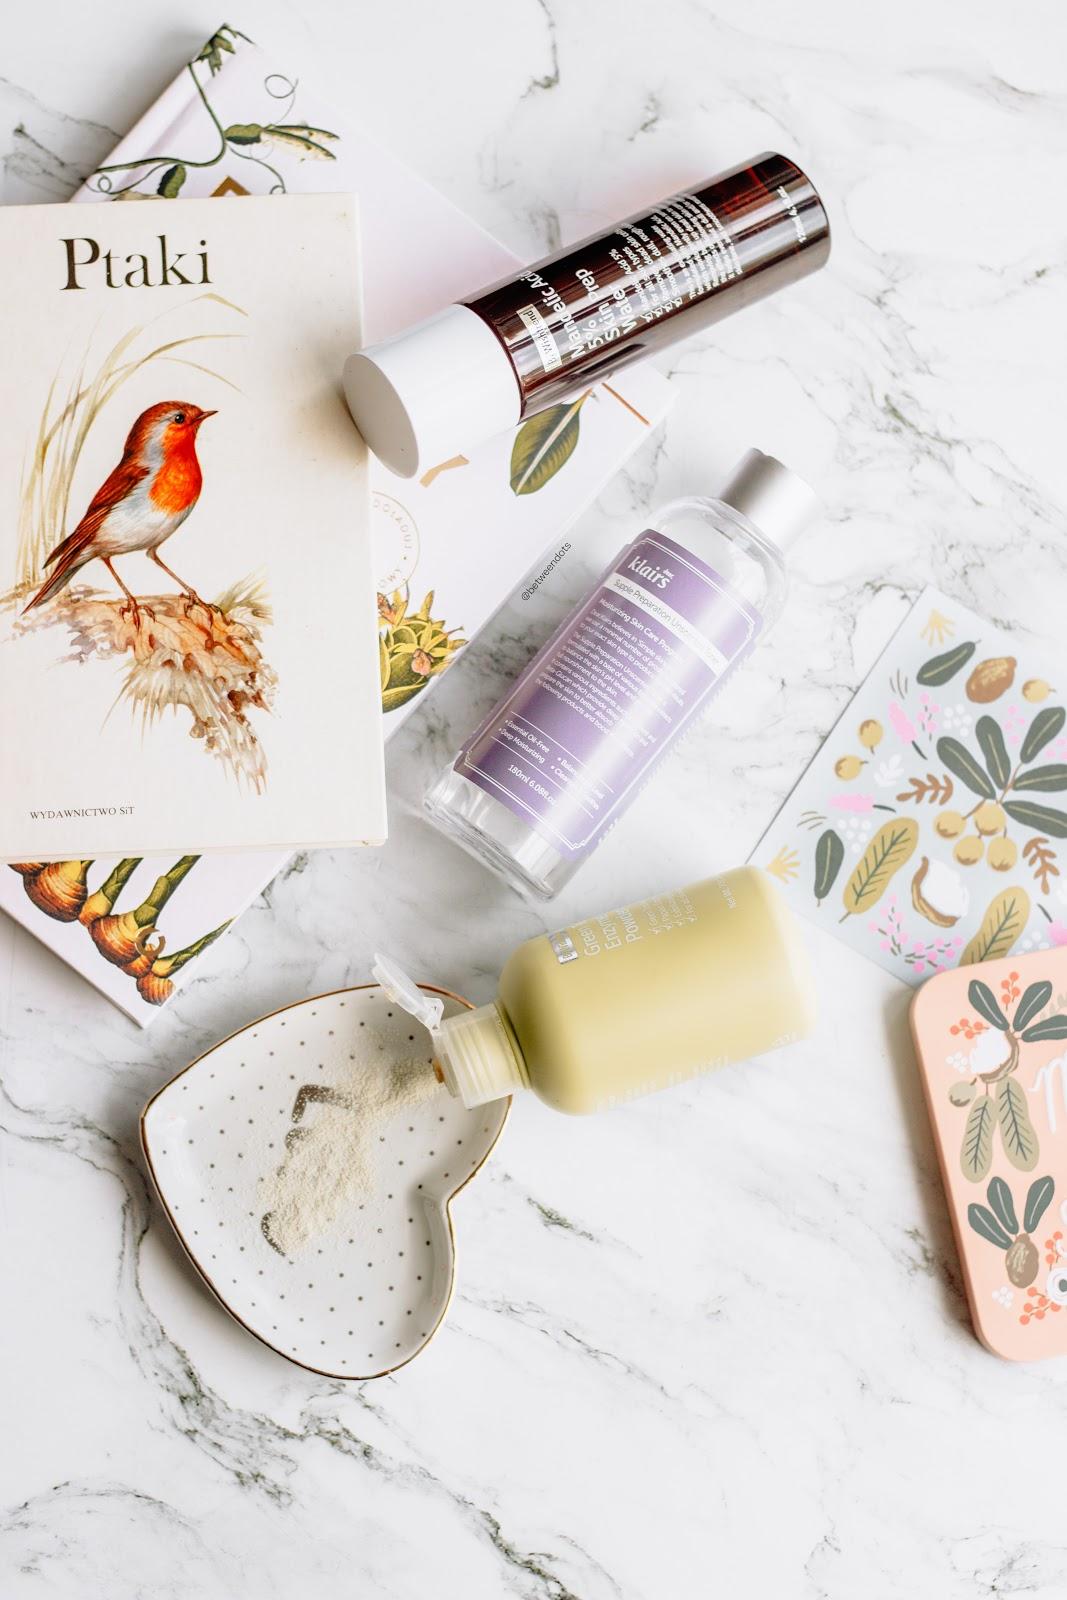 Wishtrend Cruelty Free Brand Week By Wishtrend Green Tea & Enzyme Powder Wash By Wishtrend Mandelic Acid 5% Prep Water Klairs Supple Preparation Unscented Toner  Kbeauty Asian Beauty Korean Skincare